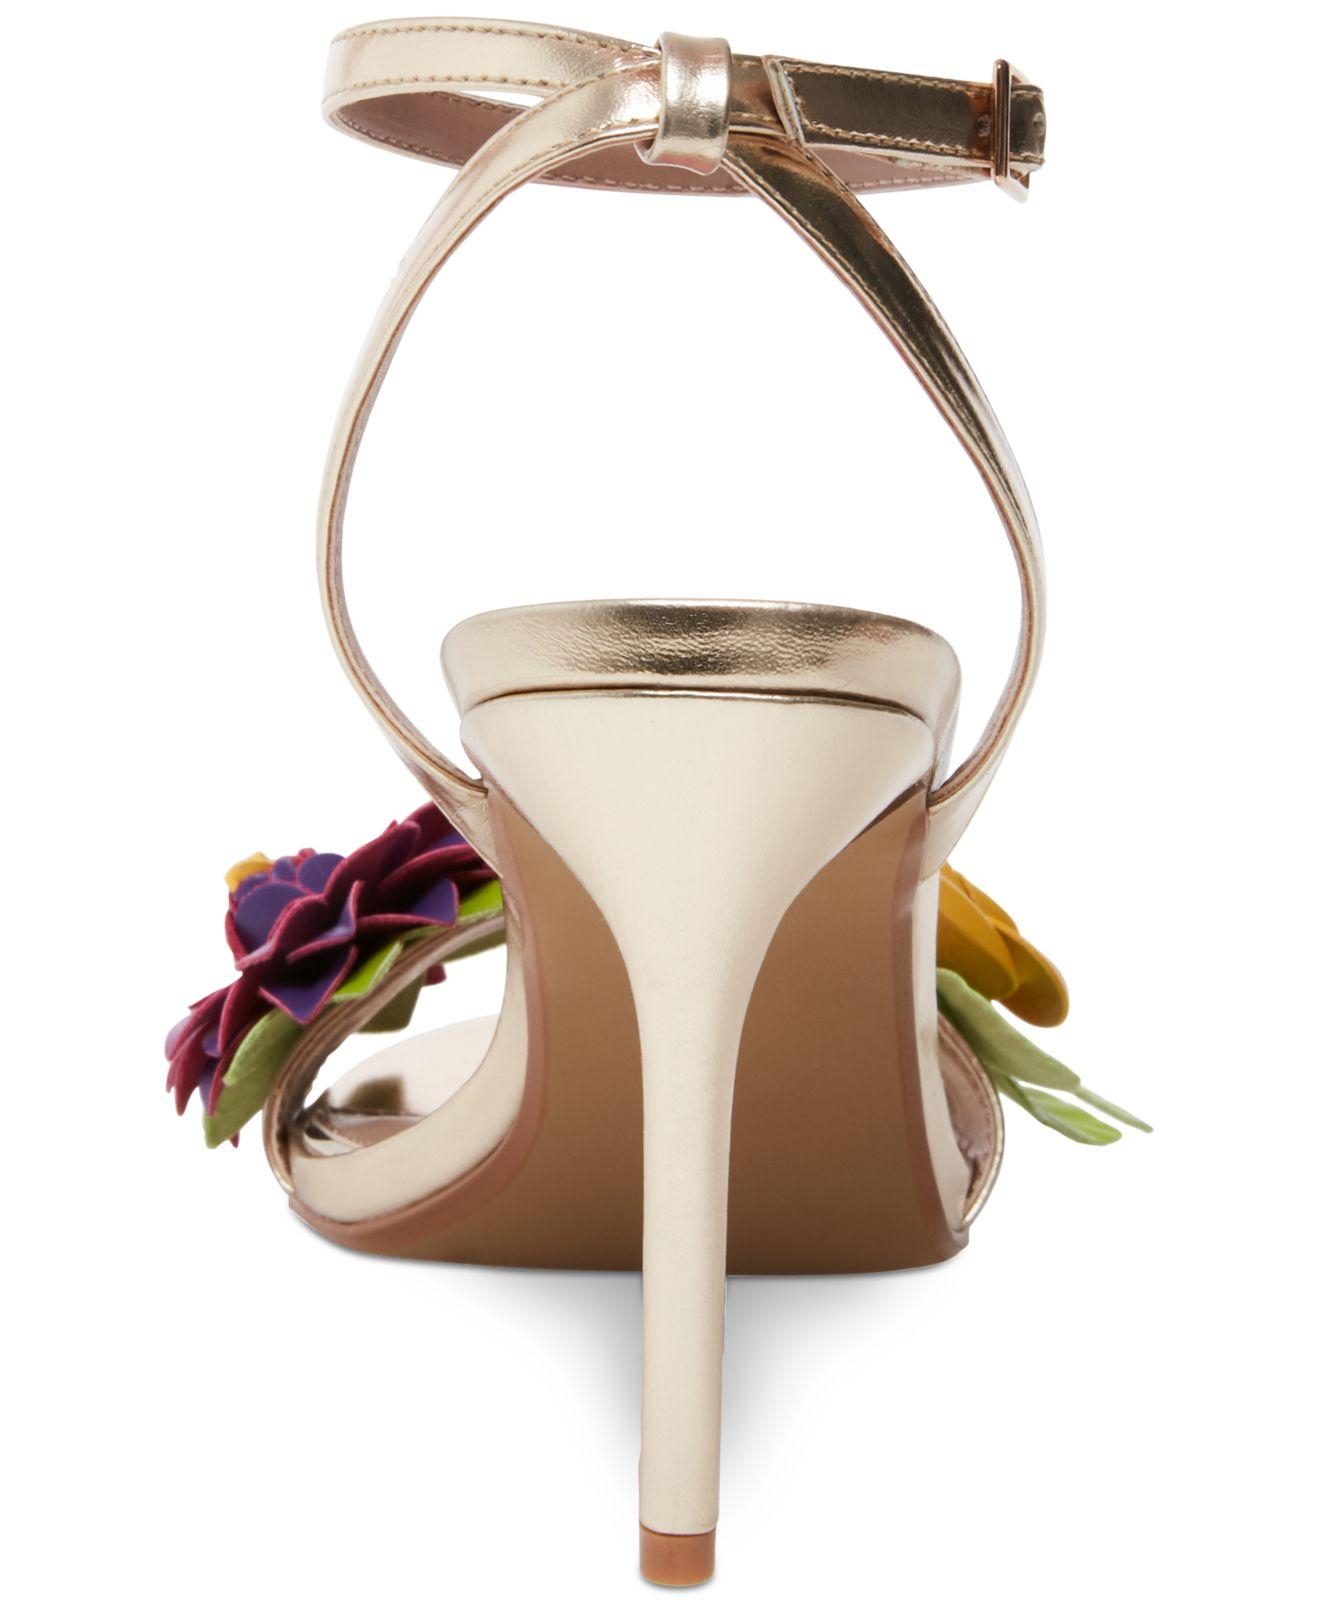 ef8fe2d3c51 Lyst - Betsey Johnson Fluer Dress Sandals in Metallic